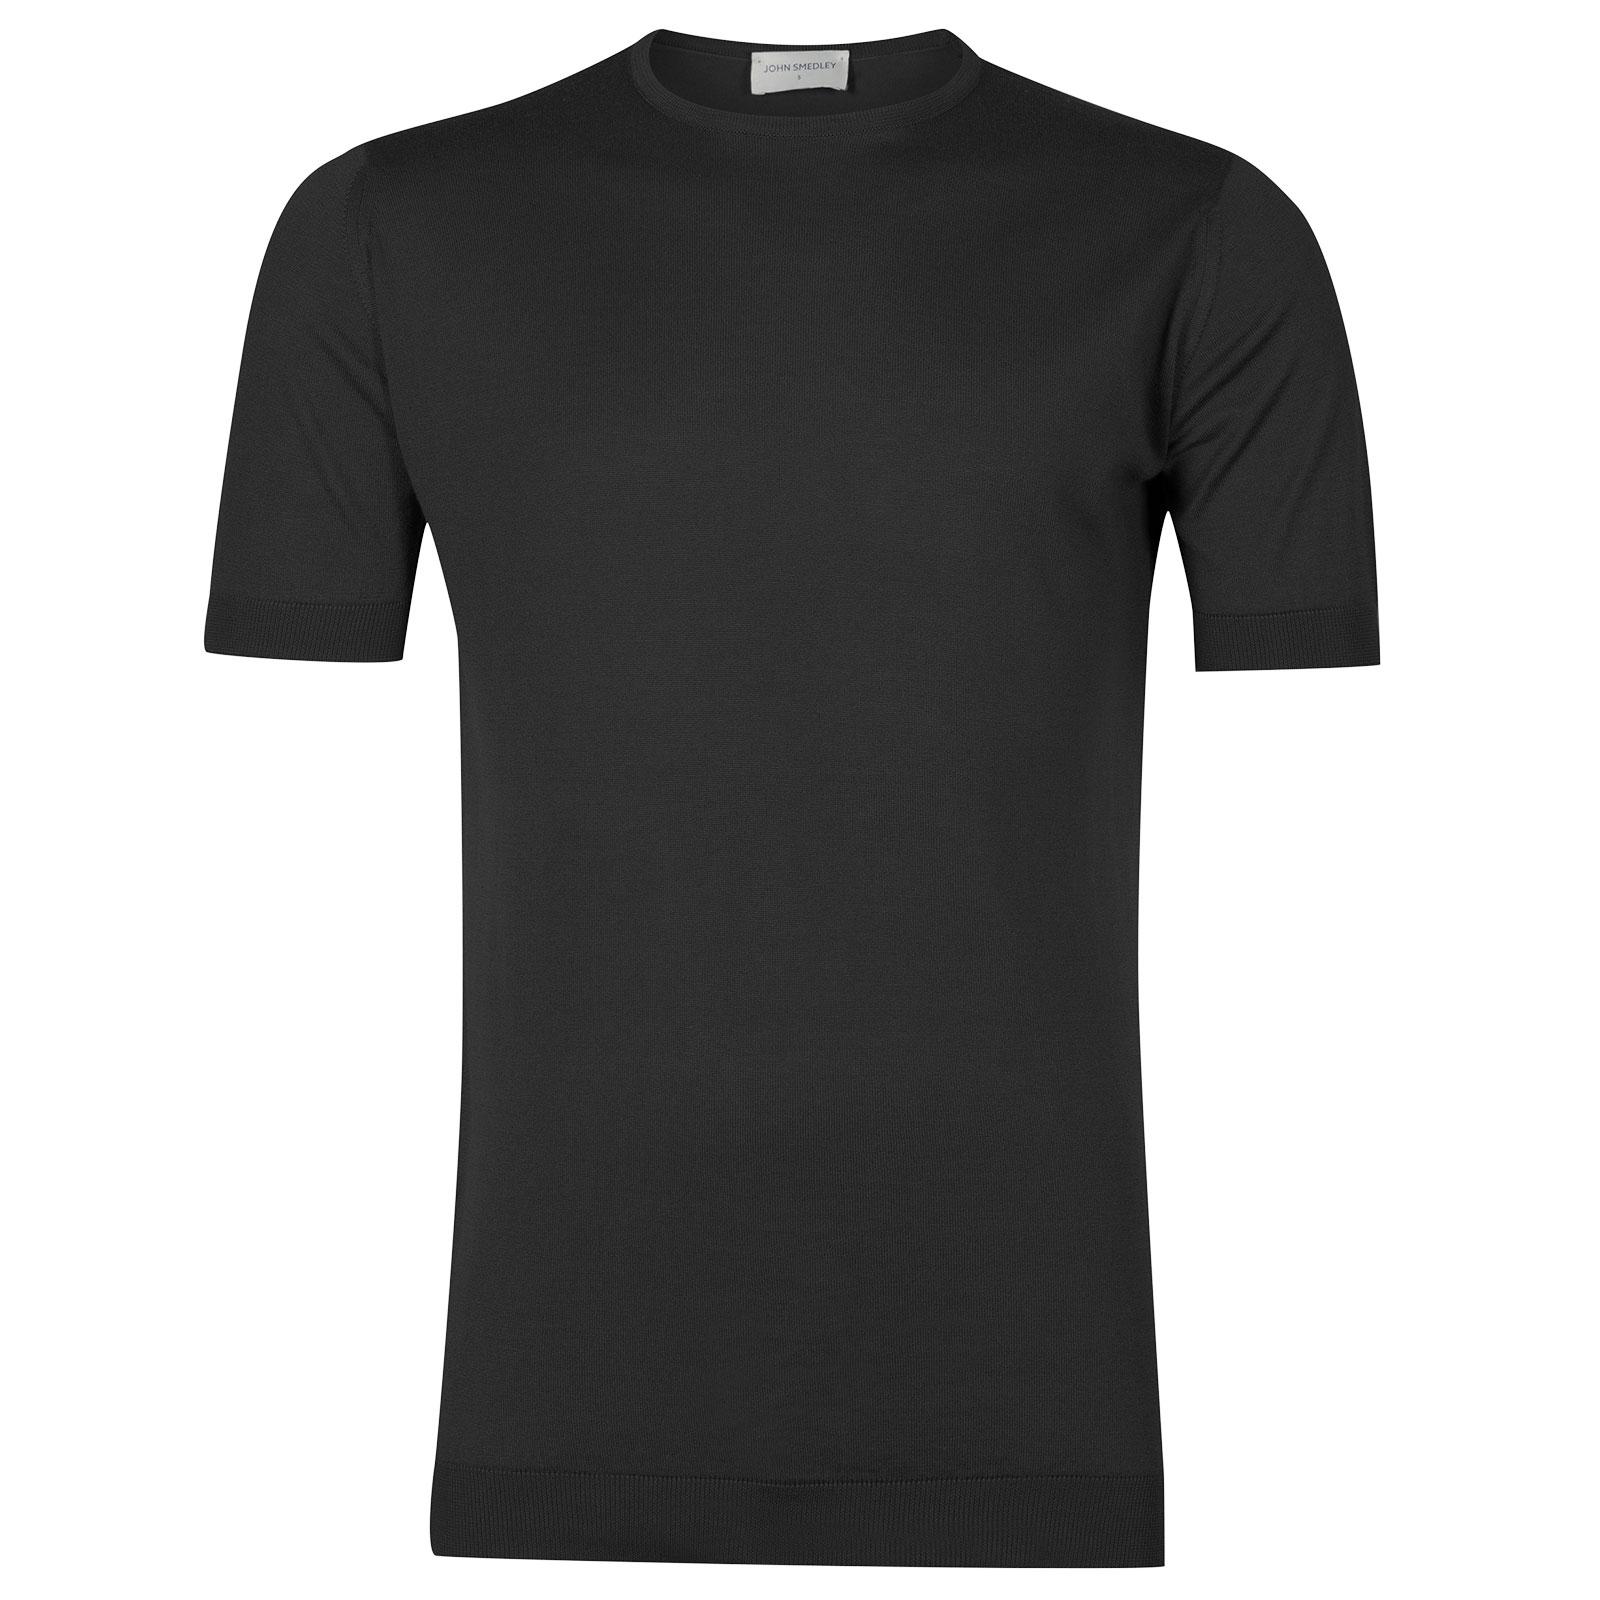 John Smedley Belden Sea Island Cotton T-shirt in Flannel Grey-XL